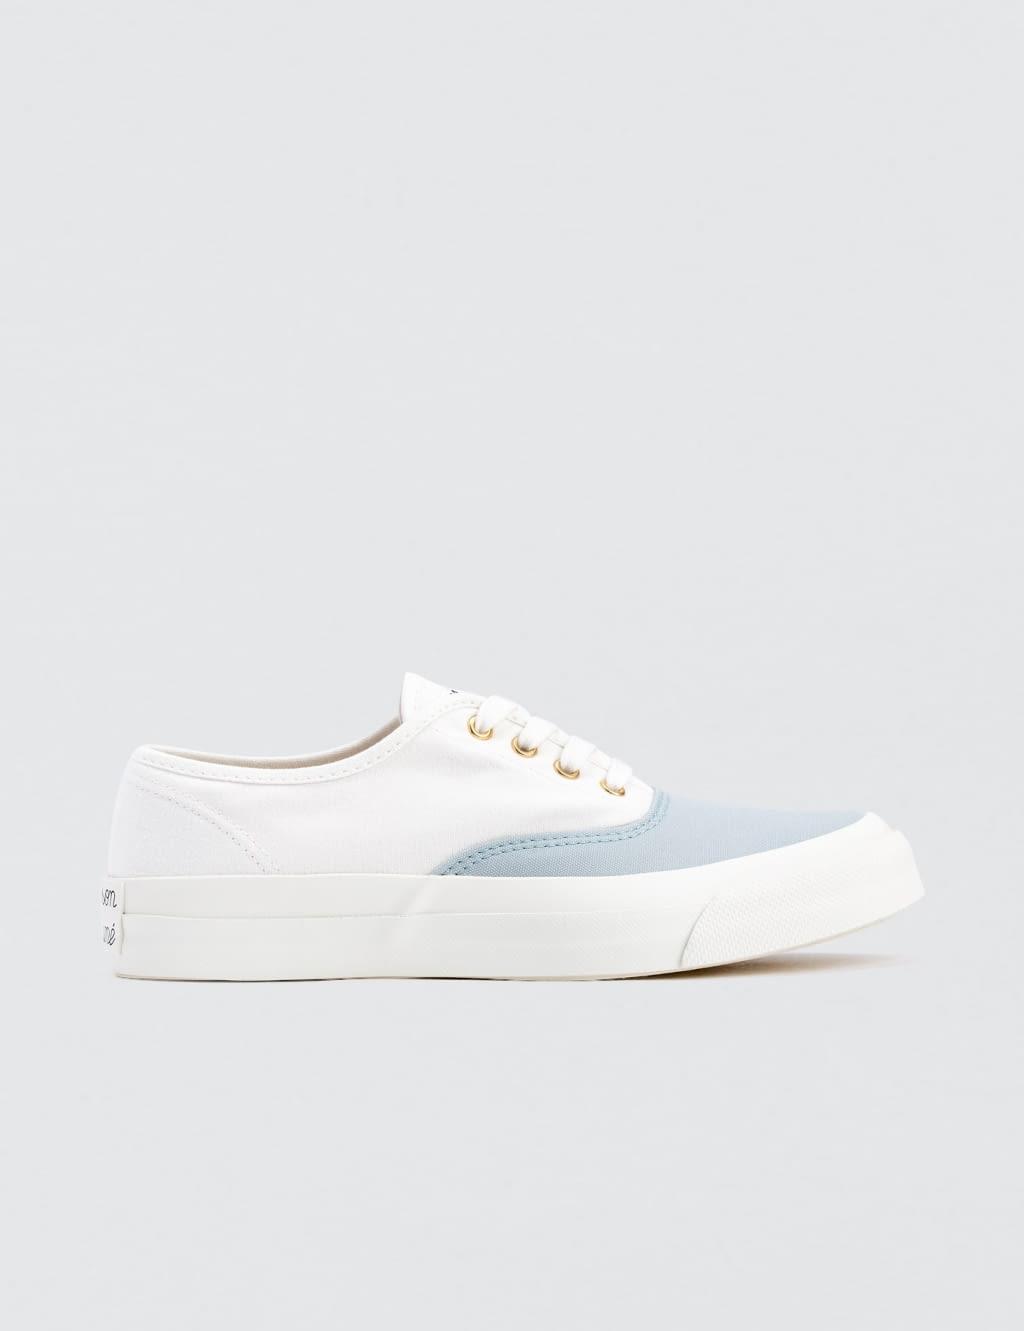 Maison Kitsuné Canvas Laced Sneakers - - EU 38/UK 5 wKkkv